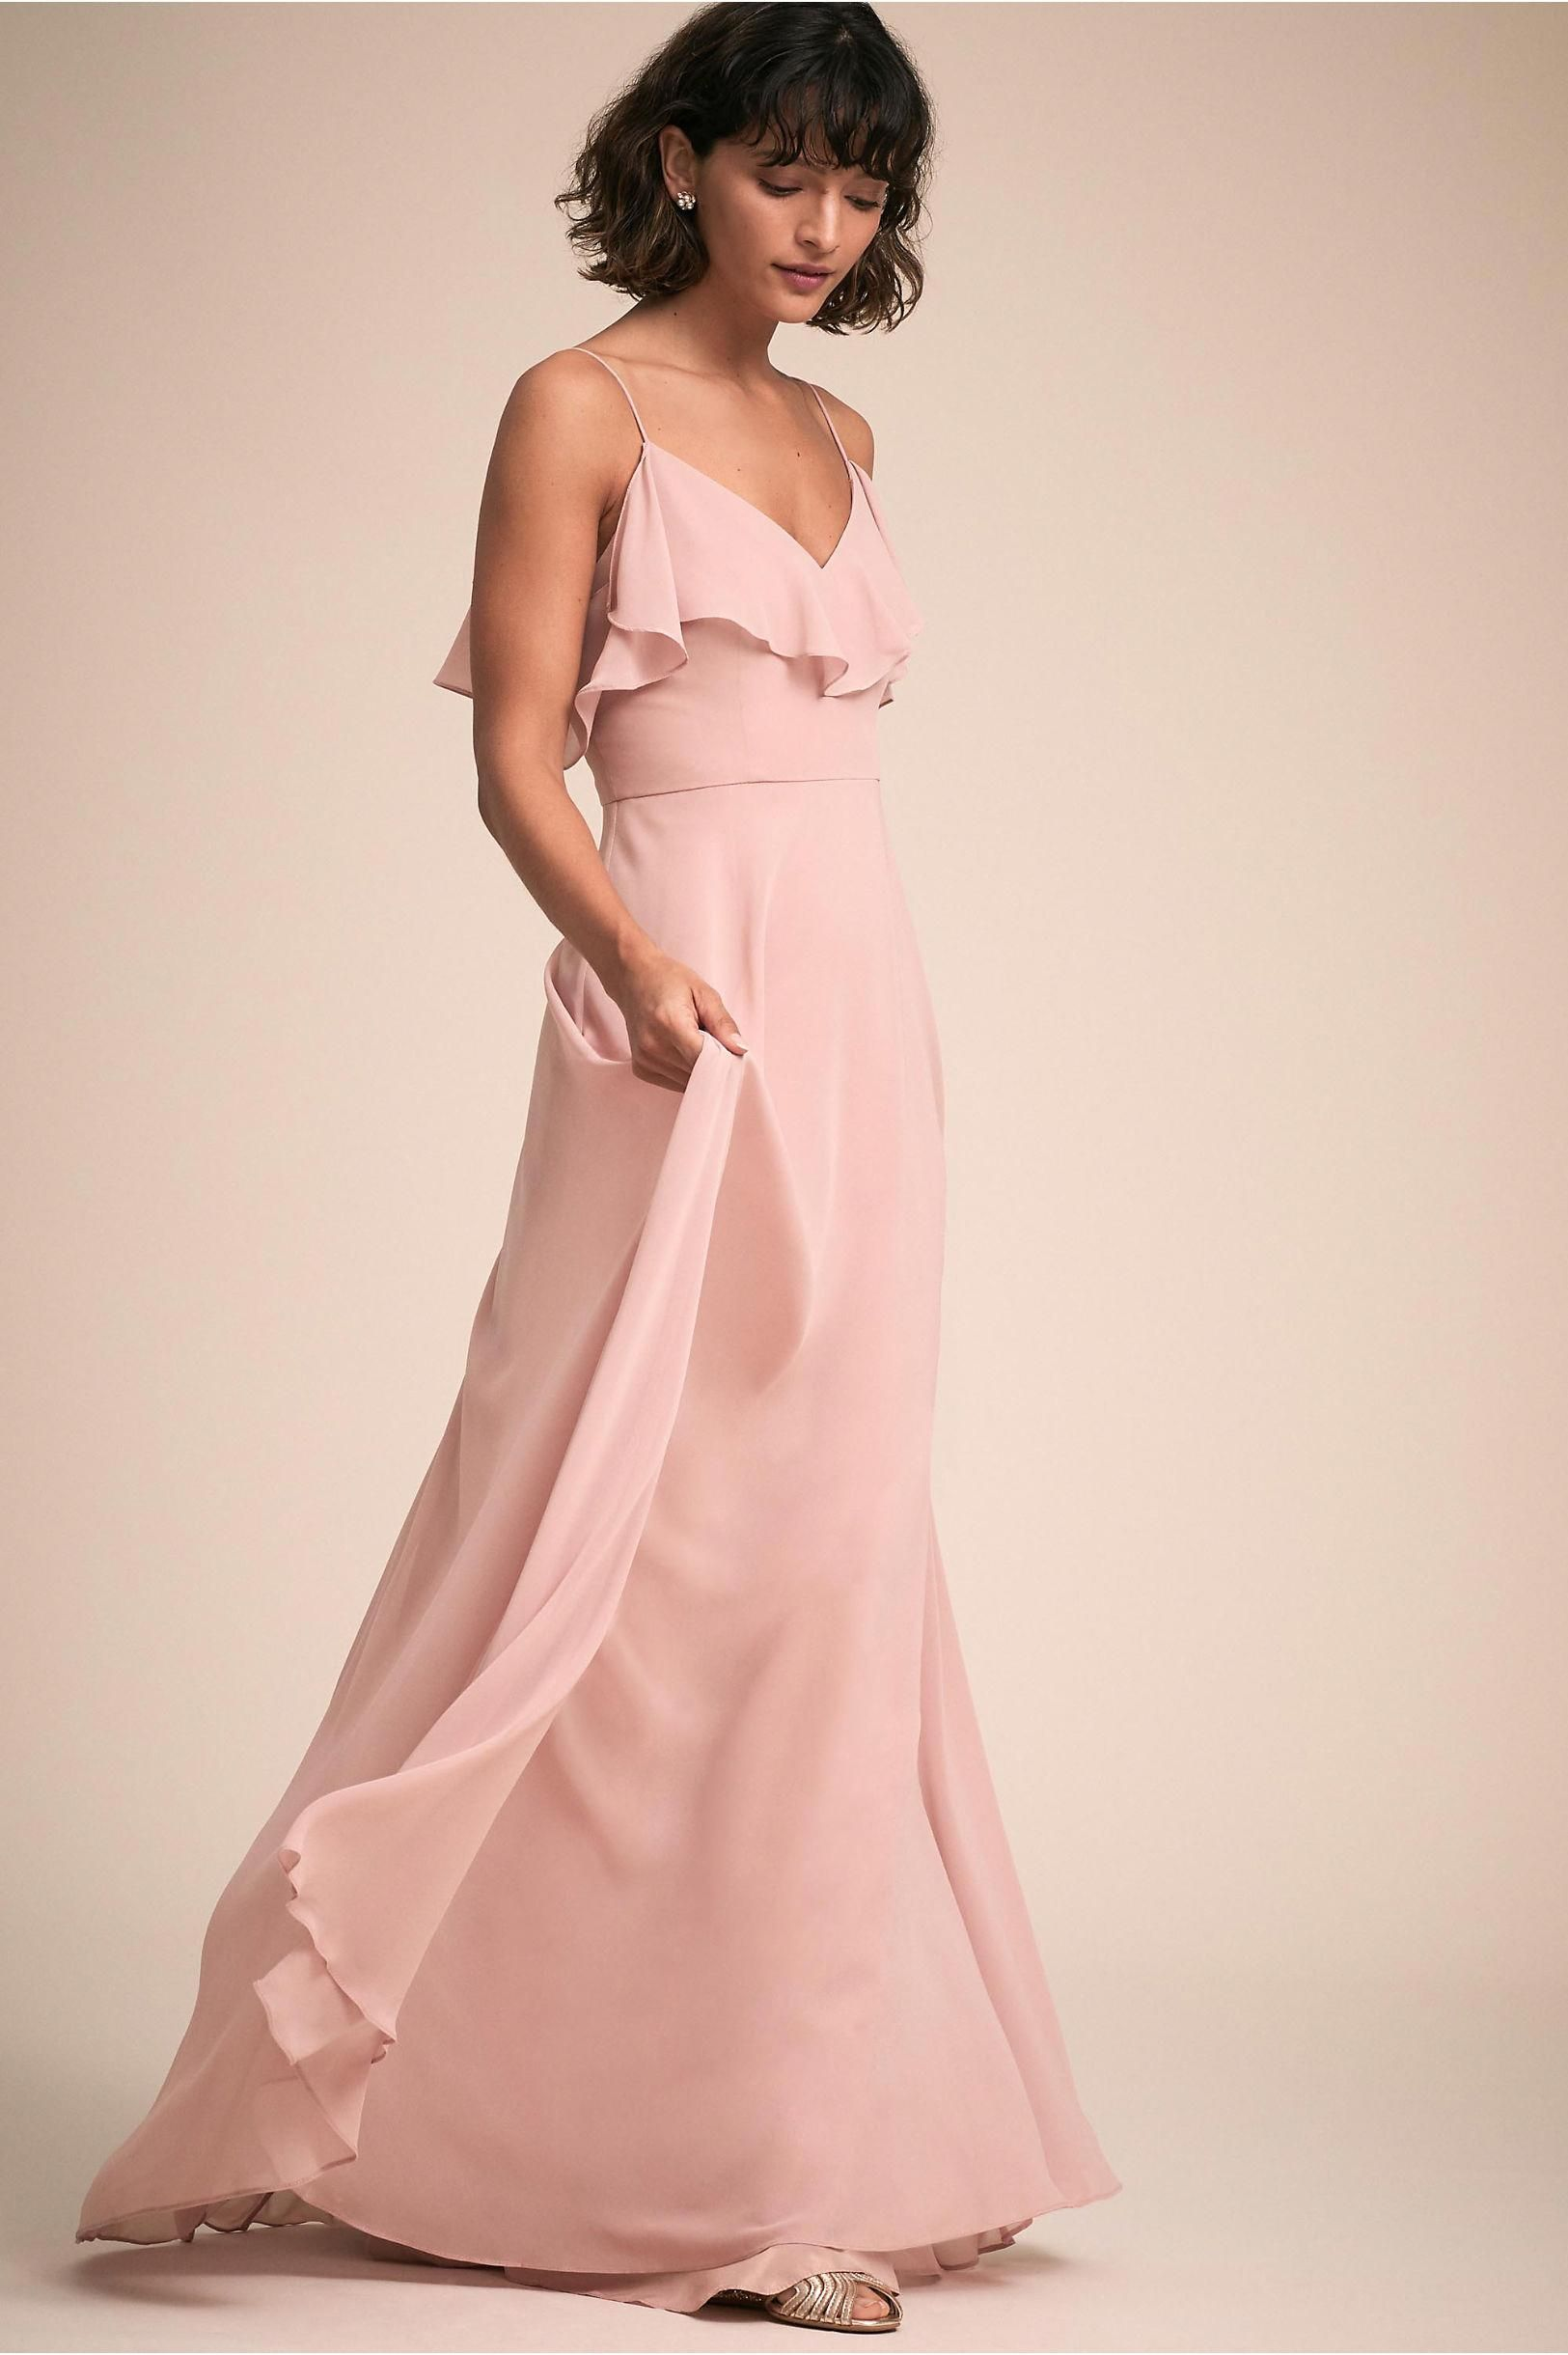 b69960c550f BHLDN s Jenny Yoo Mila Dress in Whipped Apricot  bridesmaids